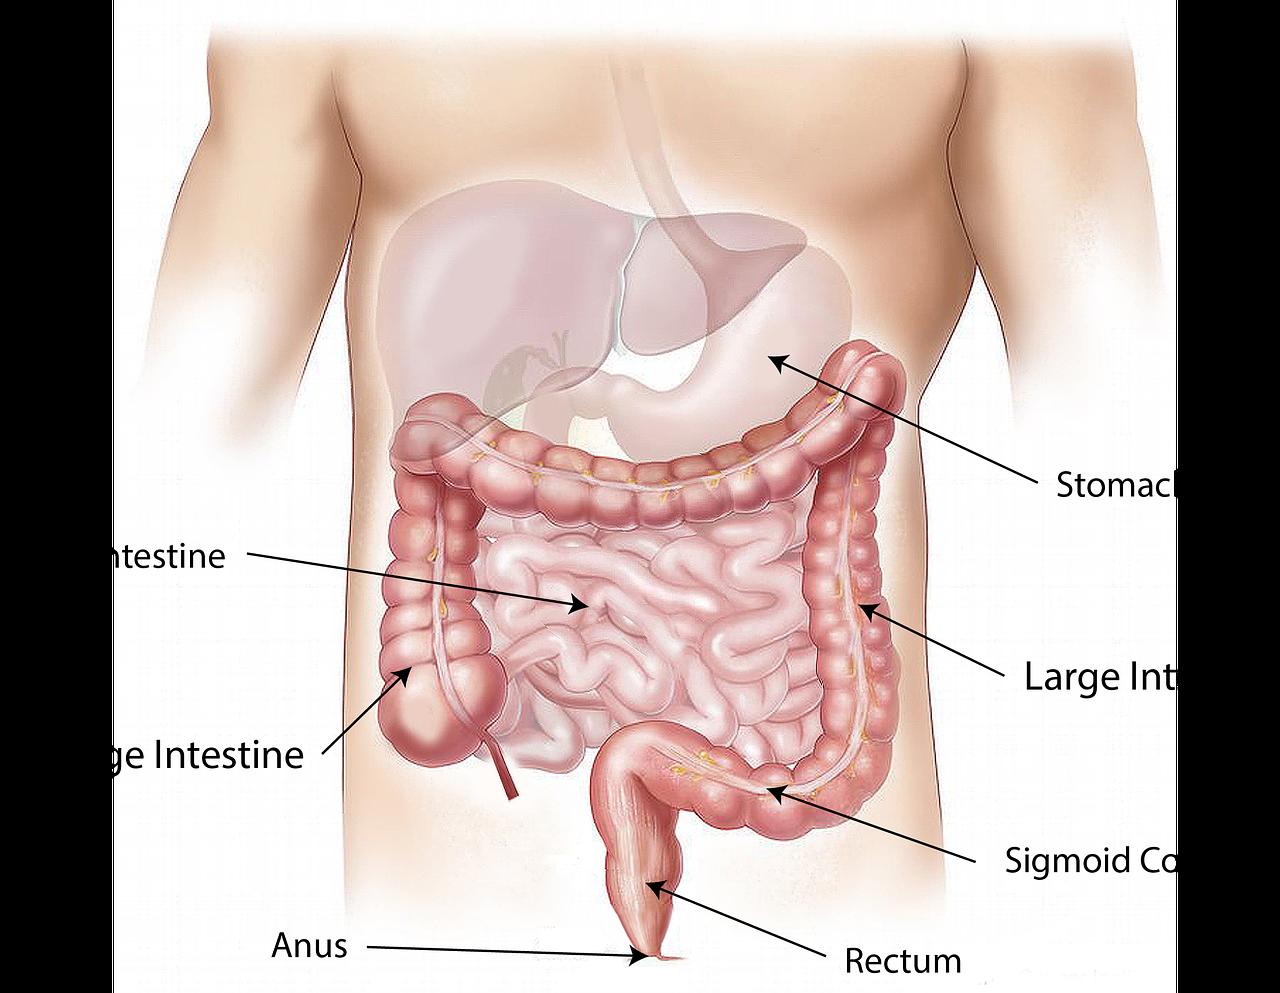 H pylori bacteria infections